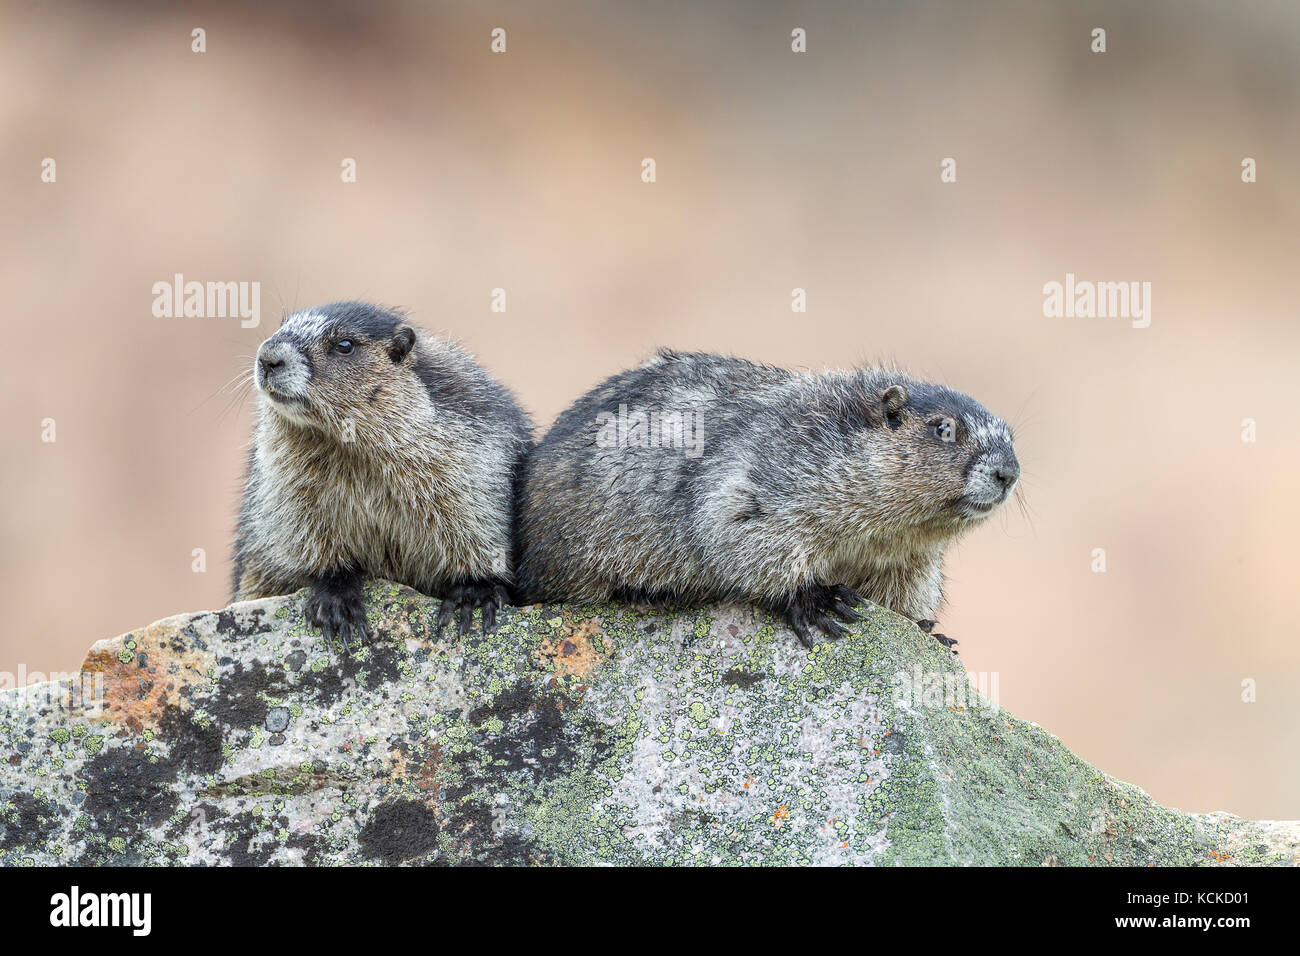 Two Hoary Marmots (Marmota caligata), Jasper National Park, Alberta, Canada - Stock Image